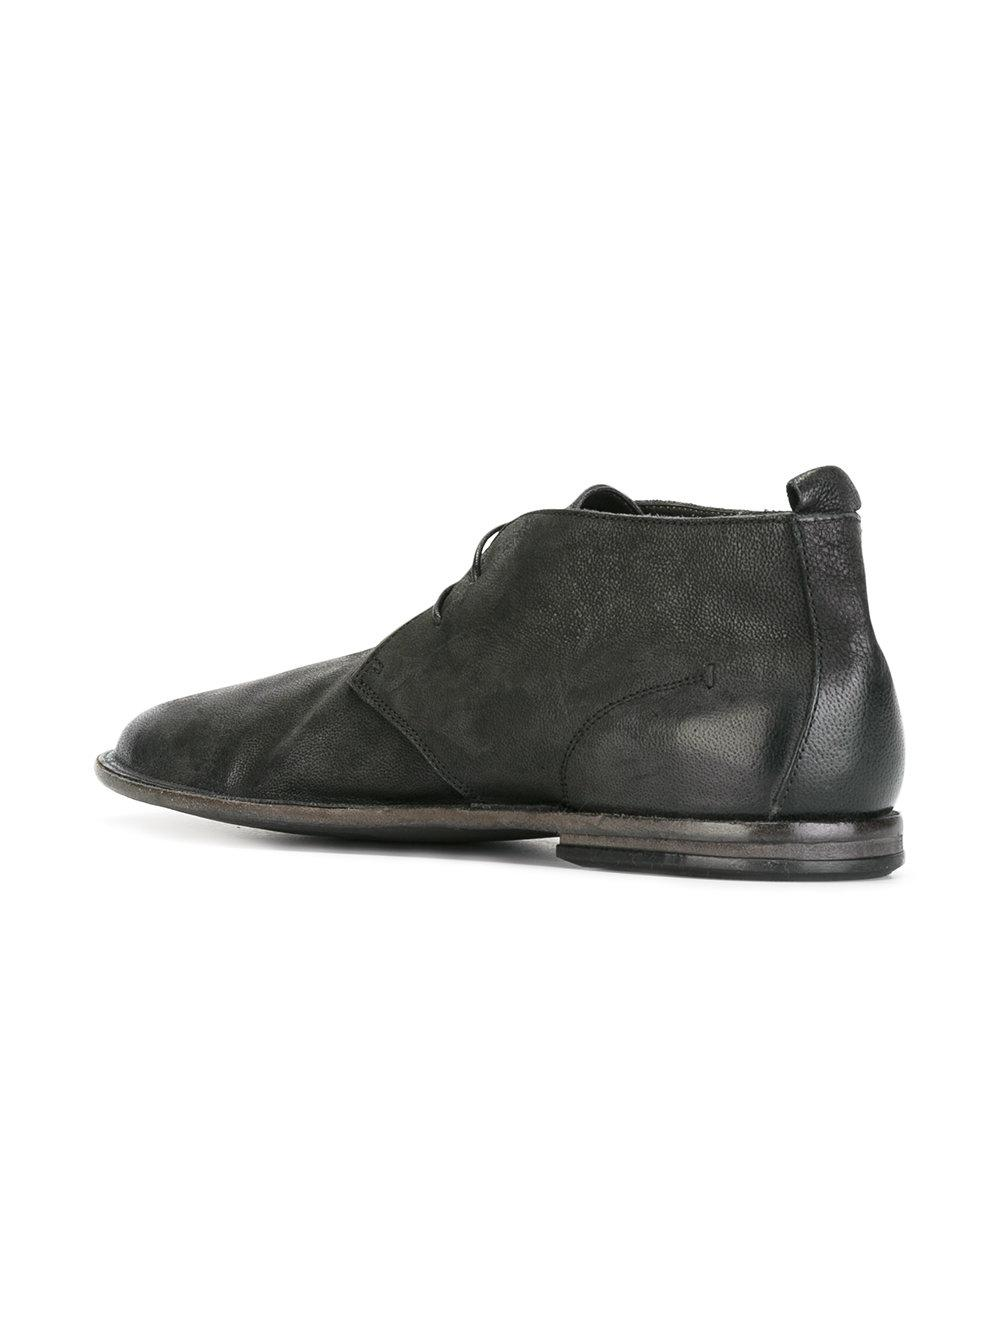 Lyst Pantanetti Classic Desert Boots In Black For Men